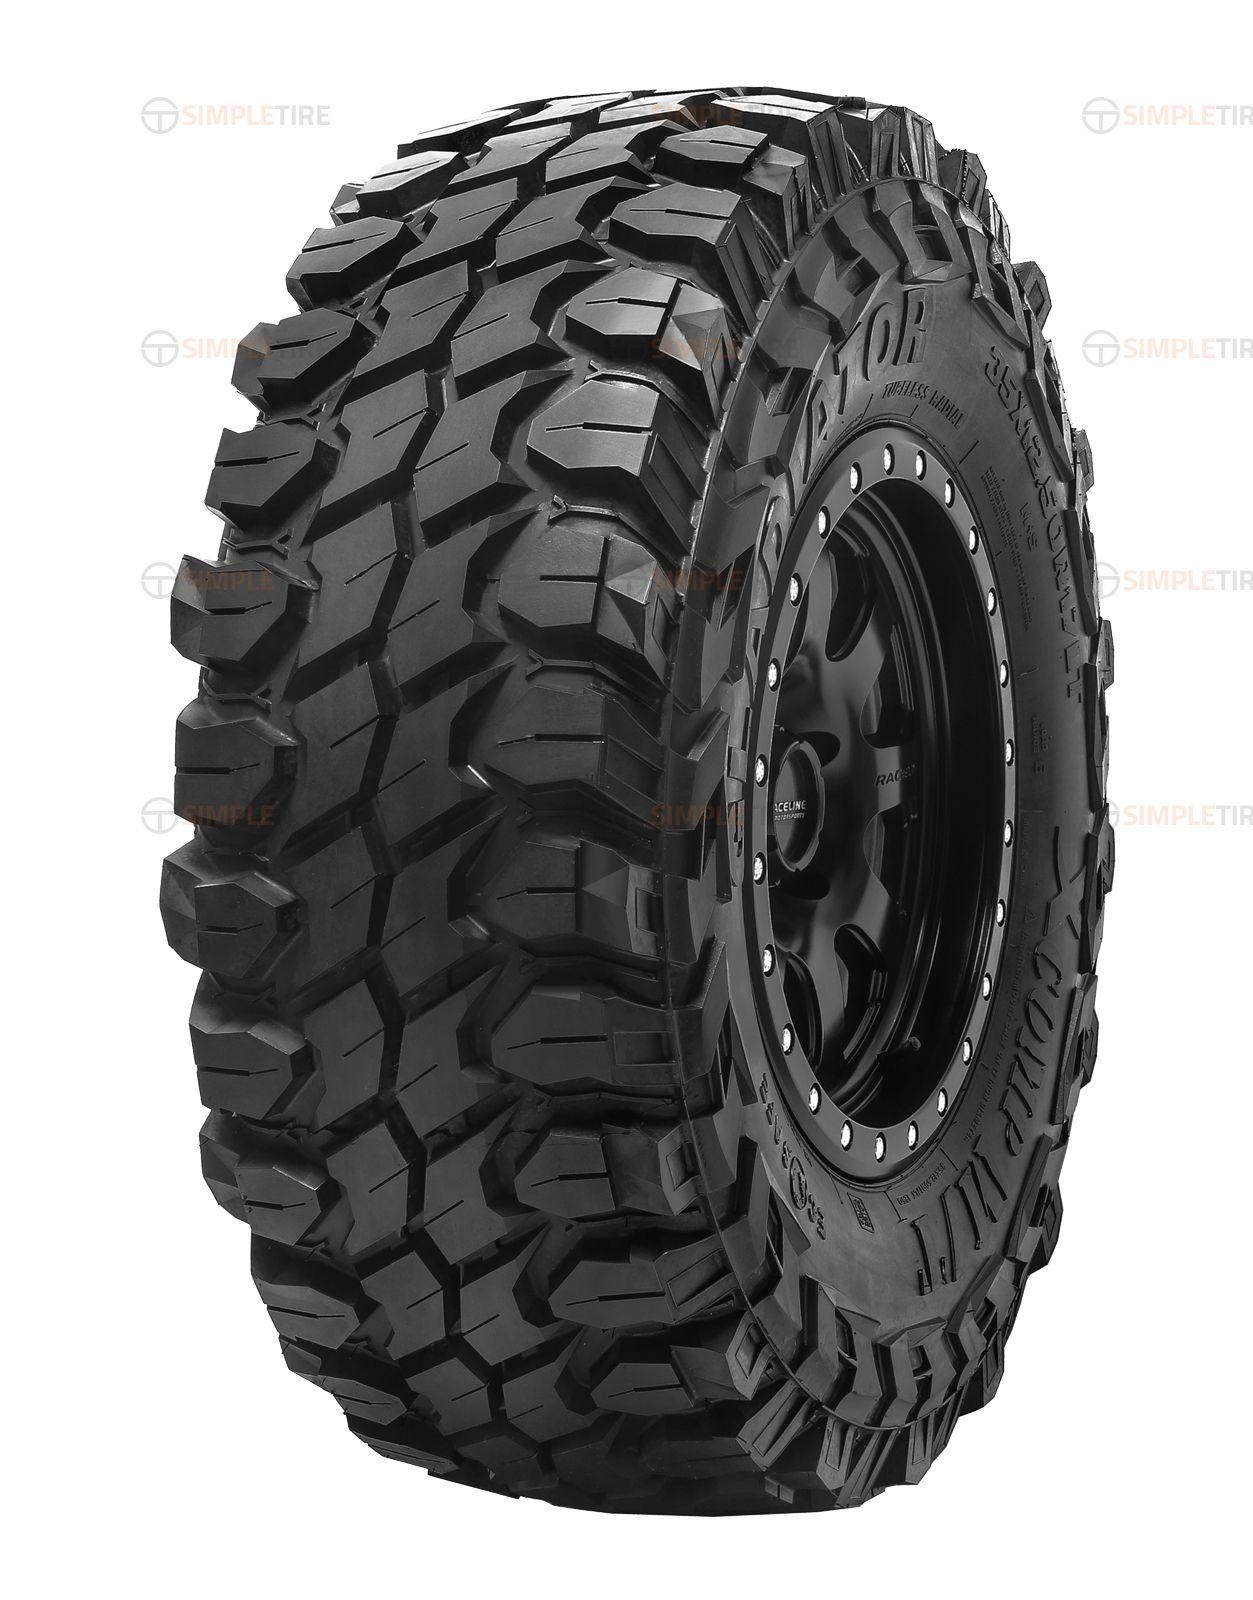 1932266763 LT265/75R16 X-COMP M/T Gladiator